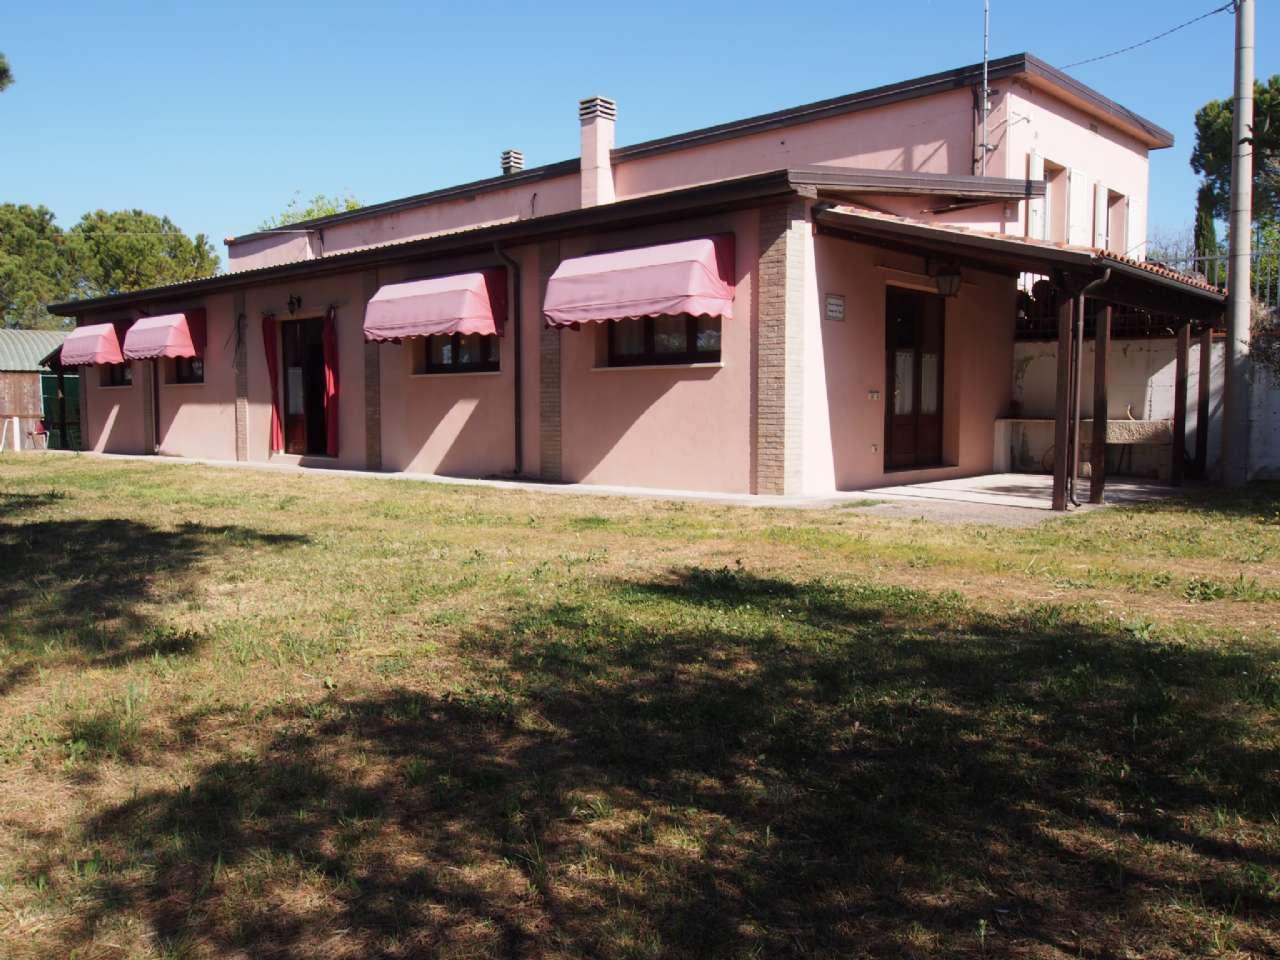 Rustico in Vendita a Santarcangelo di Romagna